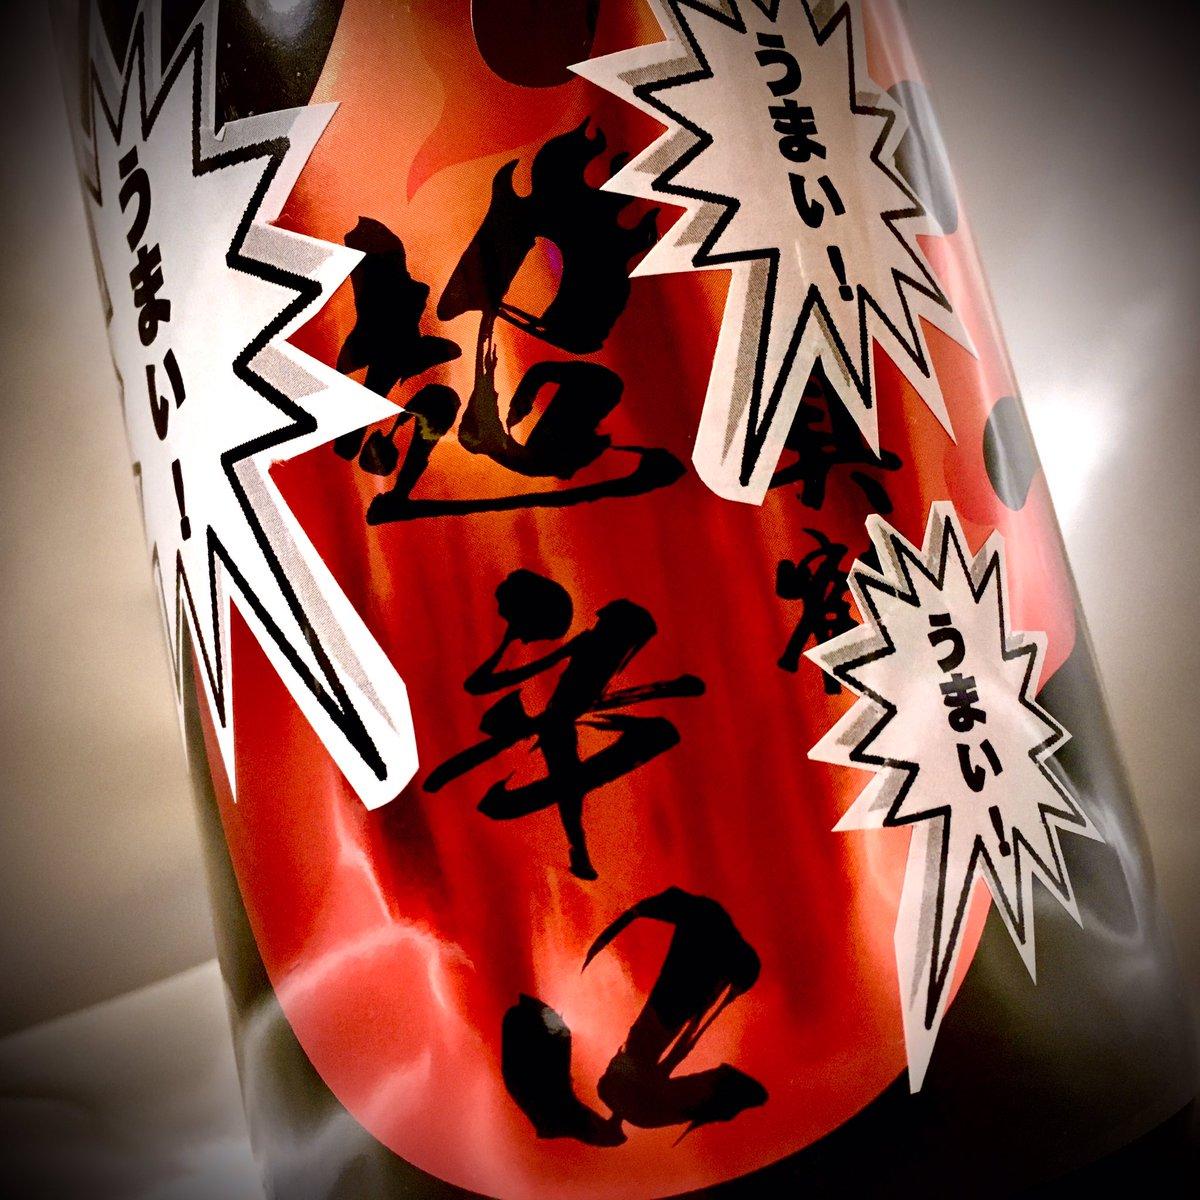 test ツイッターメディア - 昨夜のお供酒は…  宮城県加美郡加美町 田中酒造店さん 真鶴 山廃純米原酒 超辛口 煉獄 うまい!ラベル  さて、今日も事務作業ありなので、 心を燃やしていきますか。 https://t.co/iEYrLX0Bxz